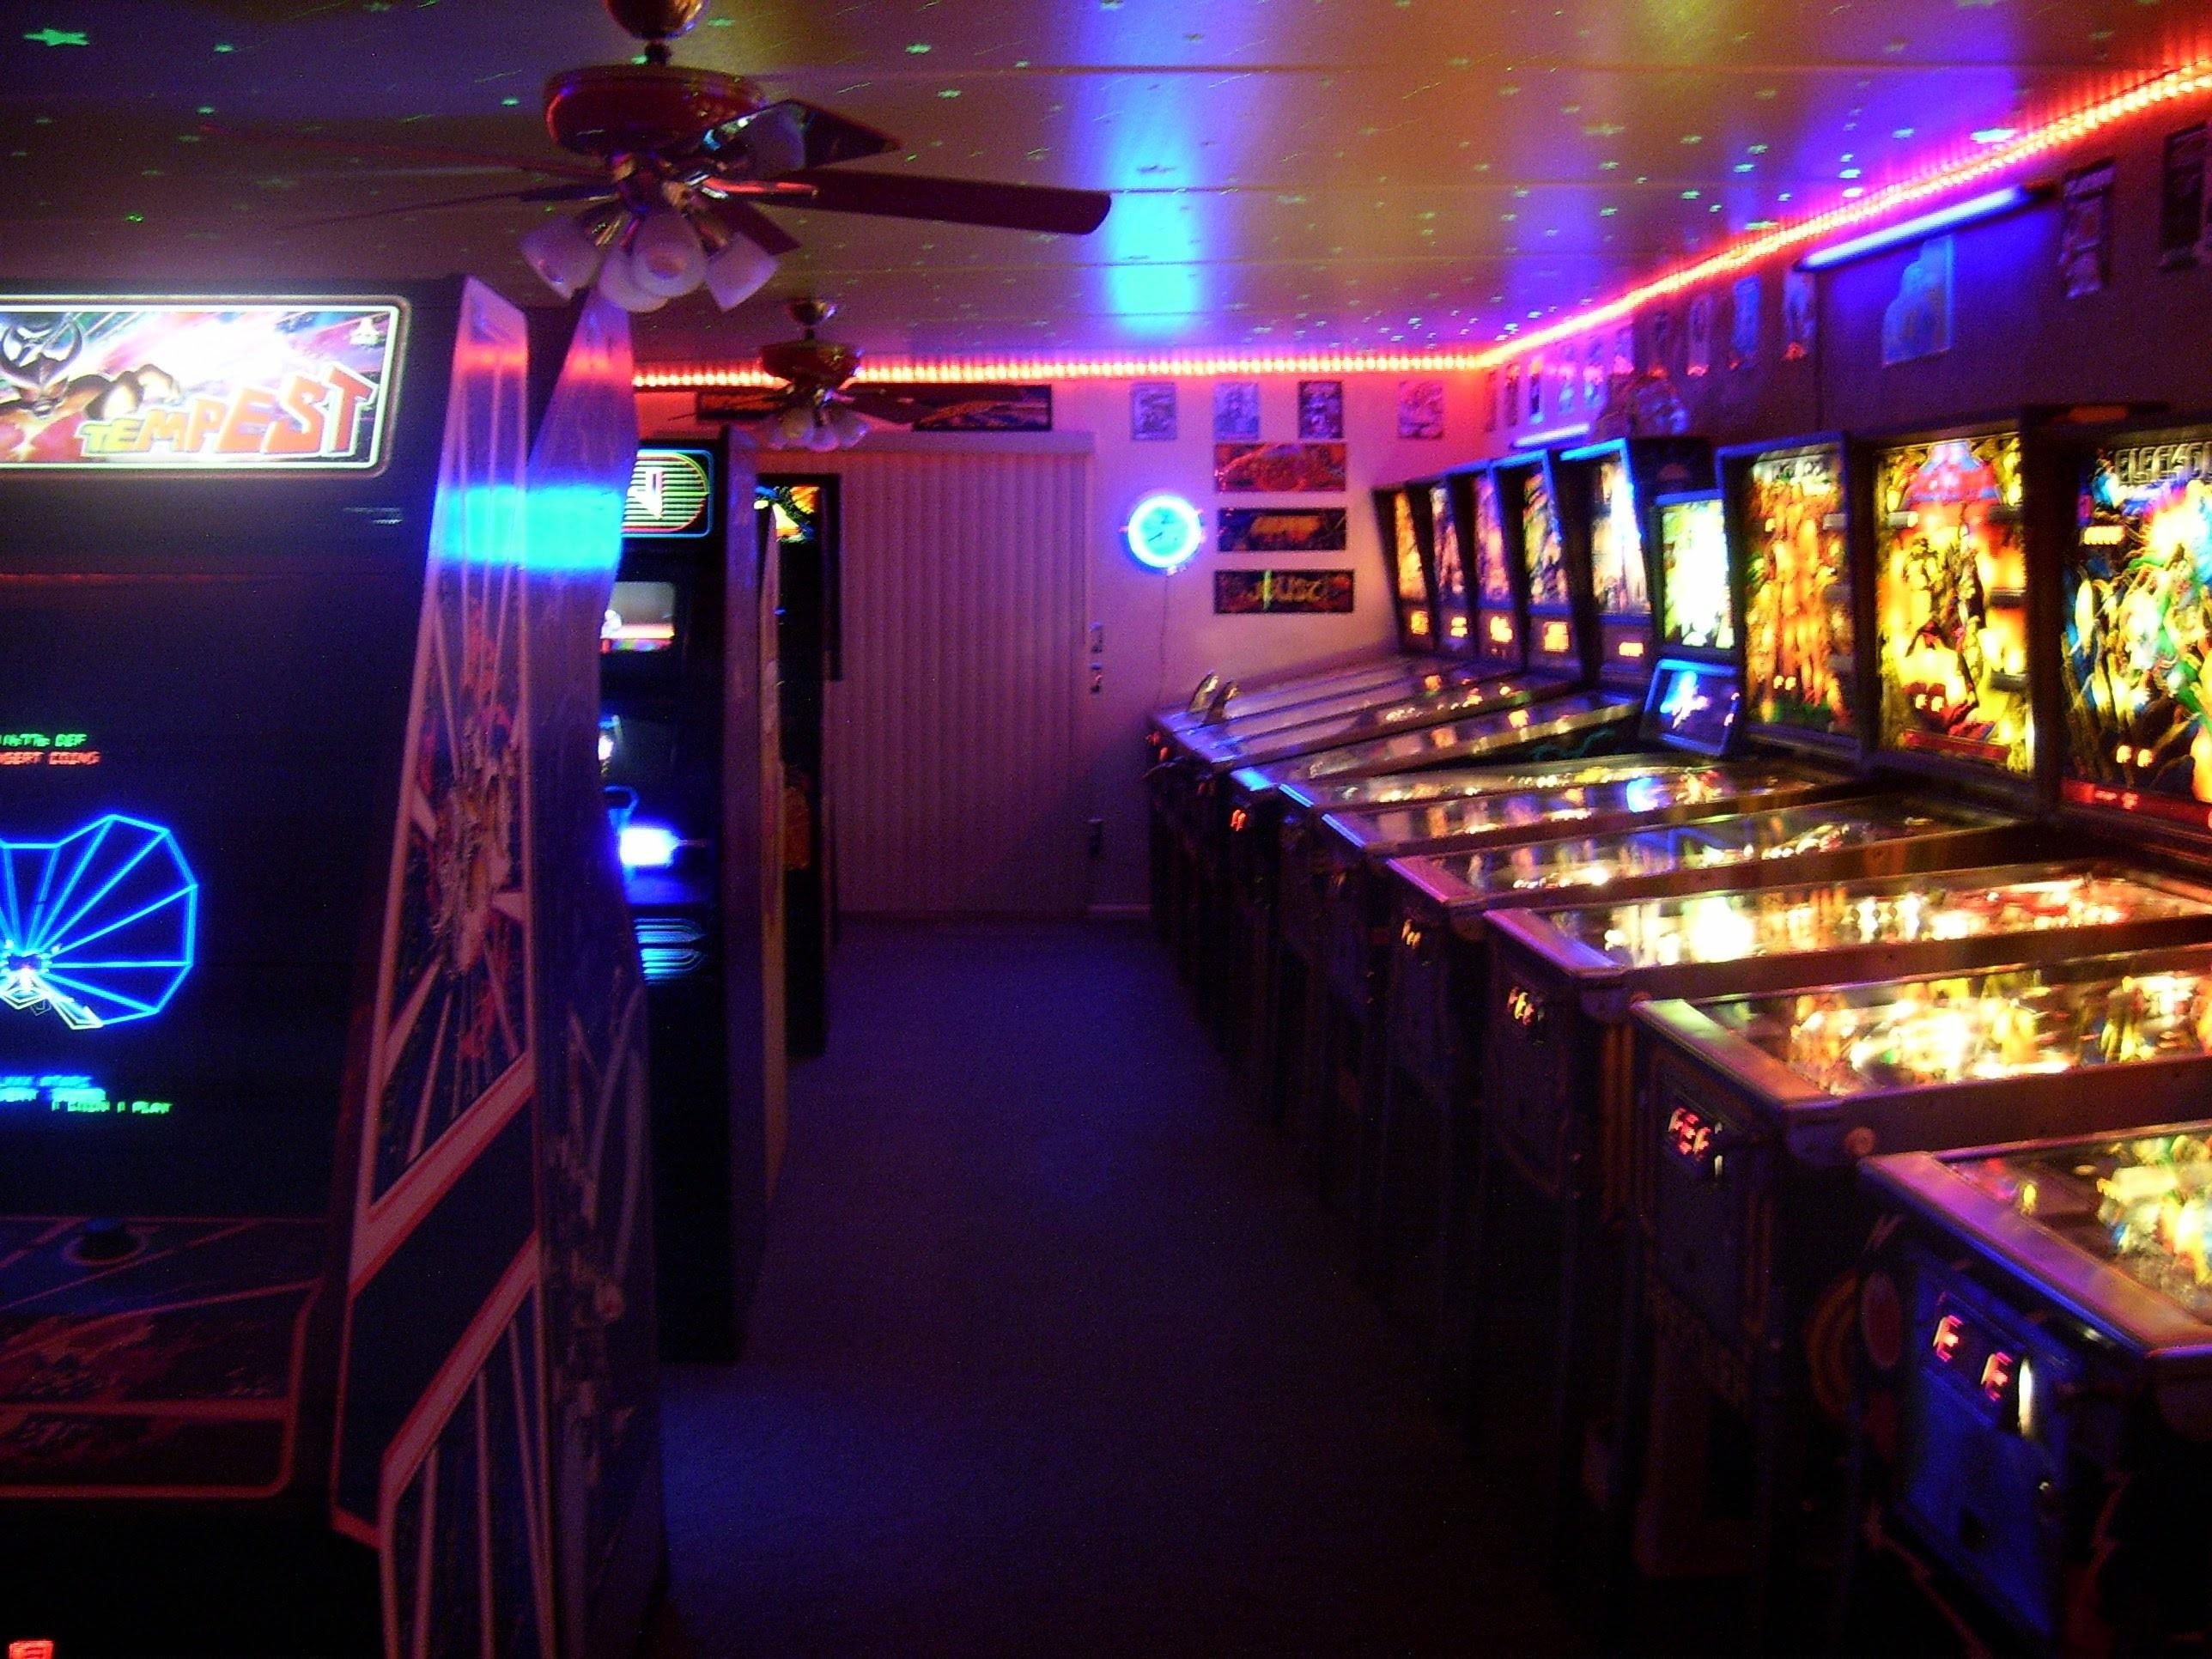 AMAZING 80'S HOME ARCADE GAME ROOM – PINBALL & VIDEO GAMES- DOUG'S ARCADE –  YouTube